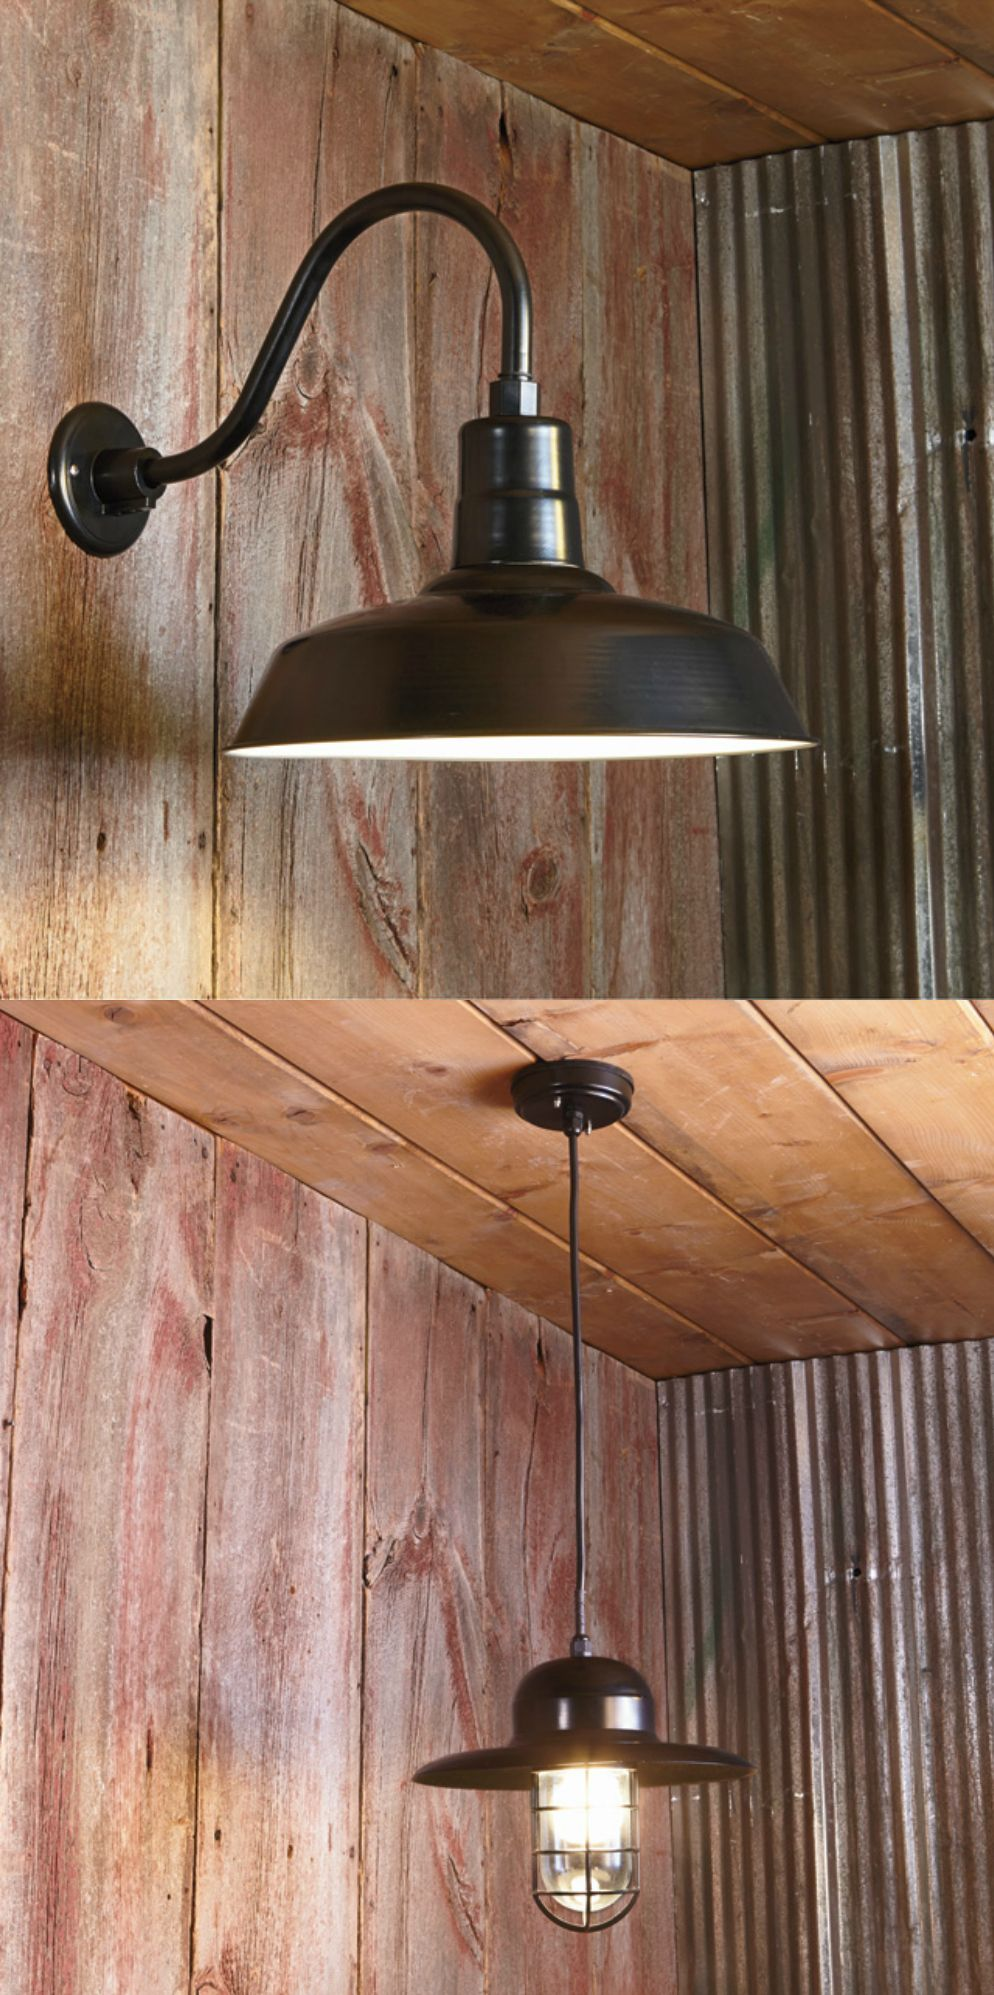 Affordable barn lights add a comfortable farmhouse feel